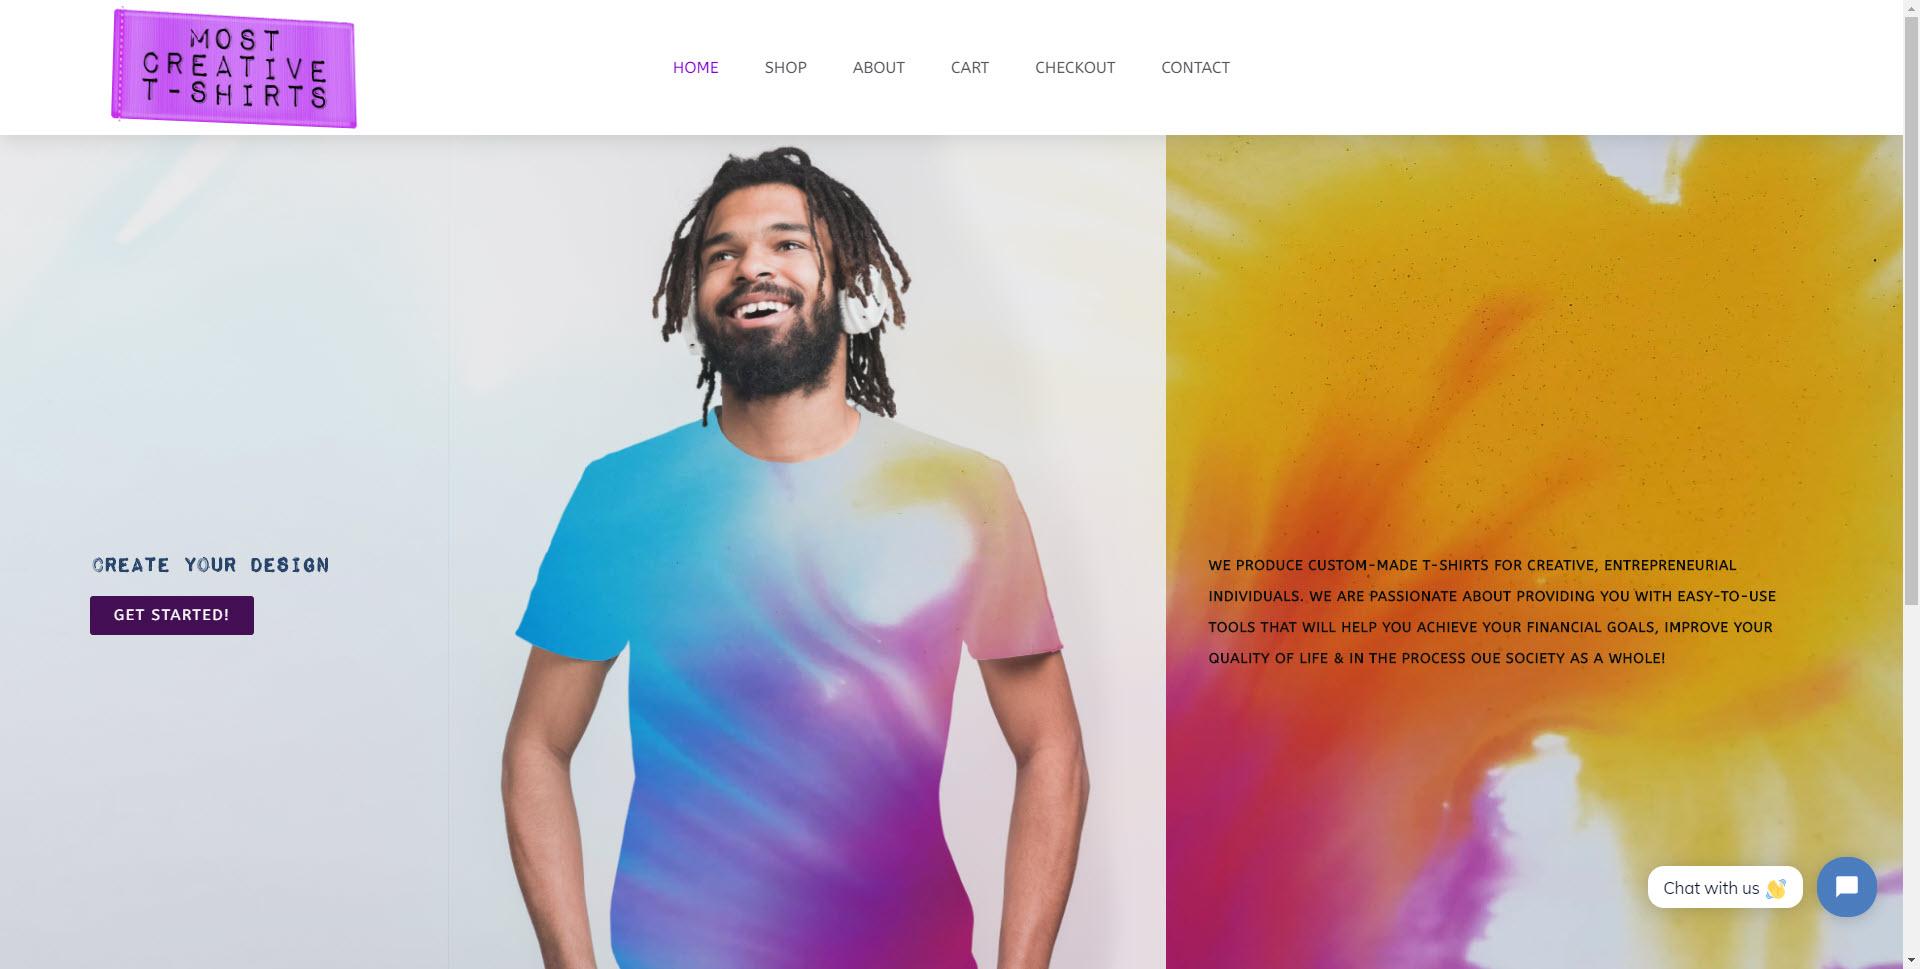 Marketing & Design for T-shirt Company 5